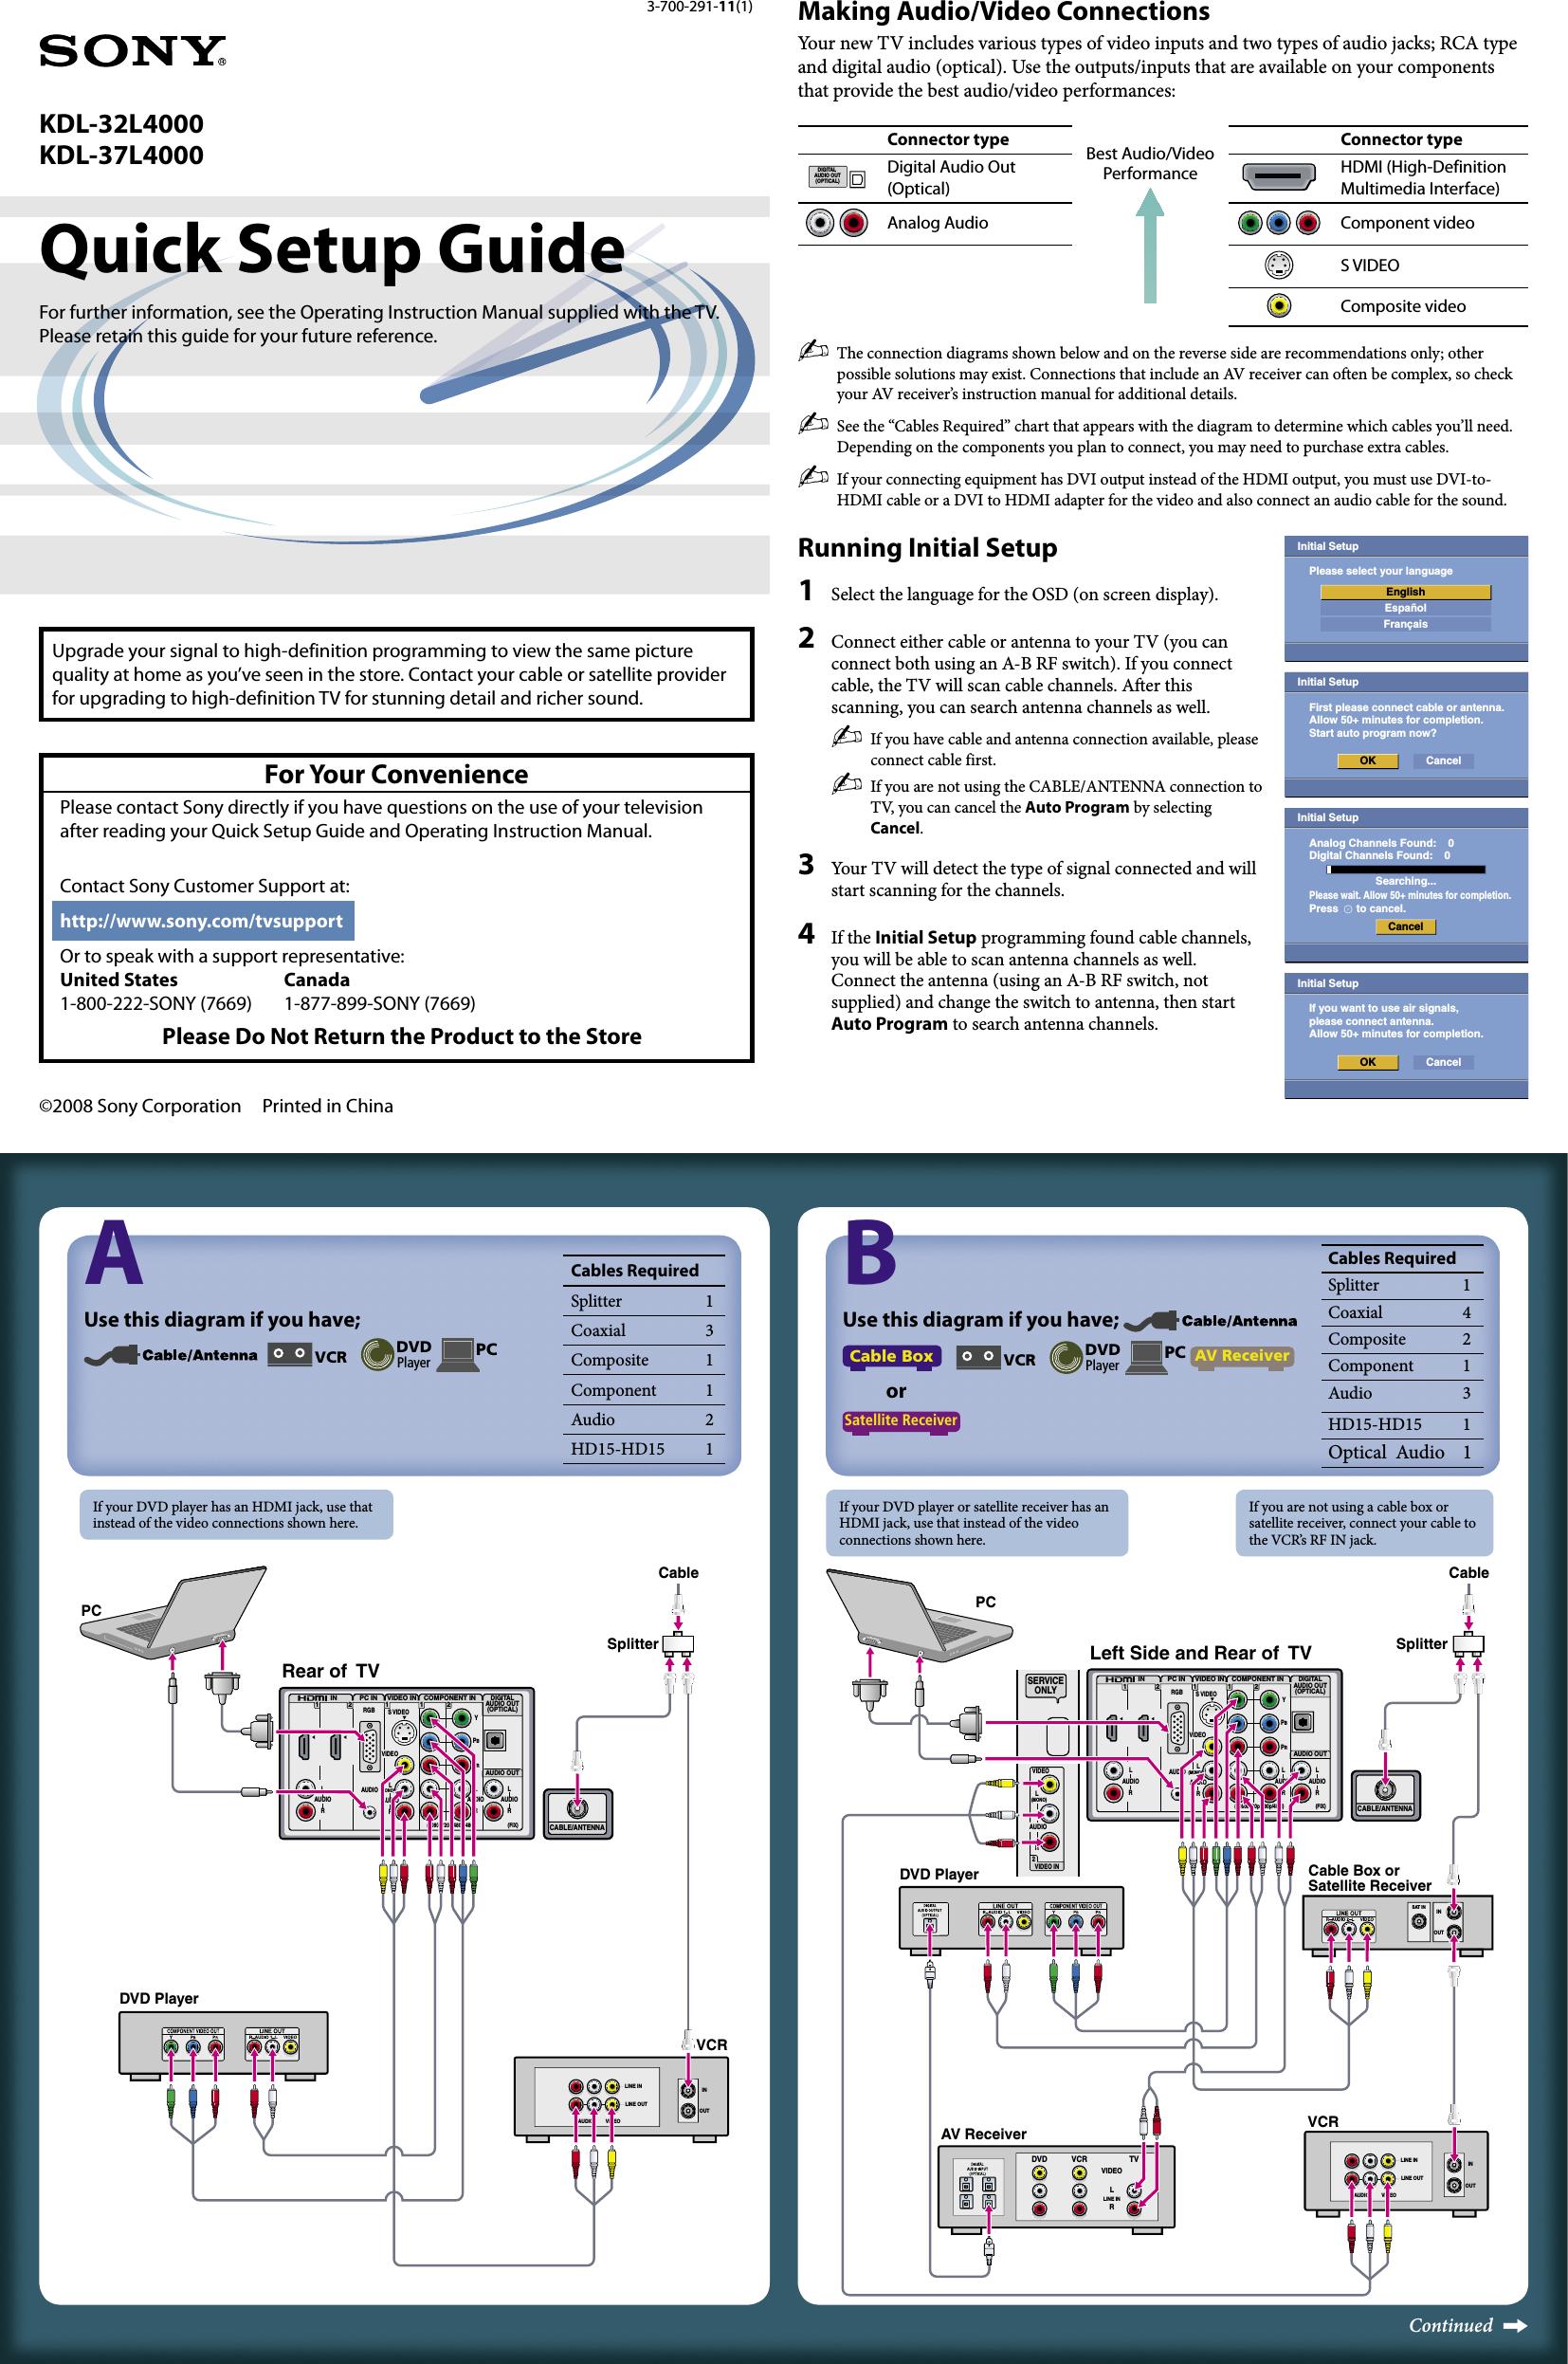 sony kdl 32l4000 32 37l4000 user manual quick setup guide kdl32l4000 qs rh usermanual wiki Quick Setup Print Microsoft Quick Guide